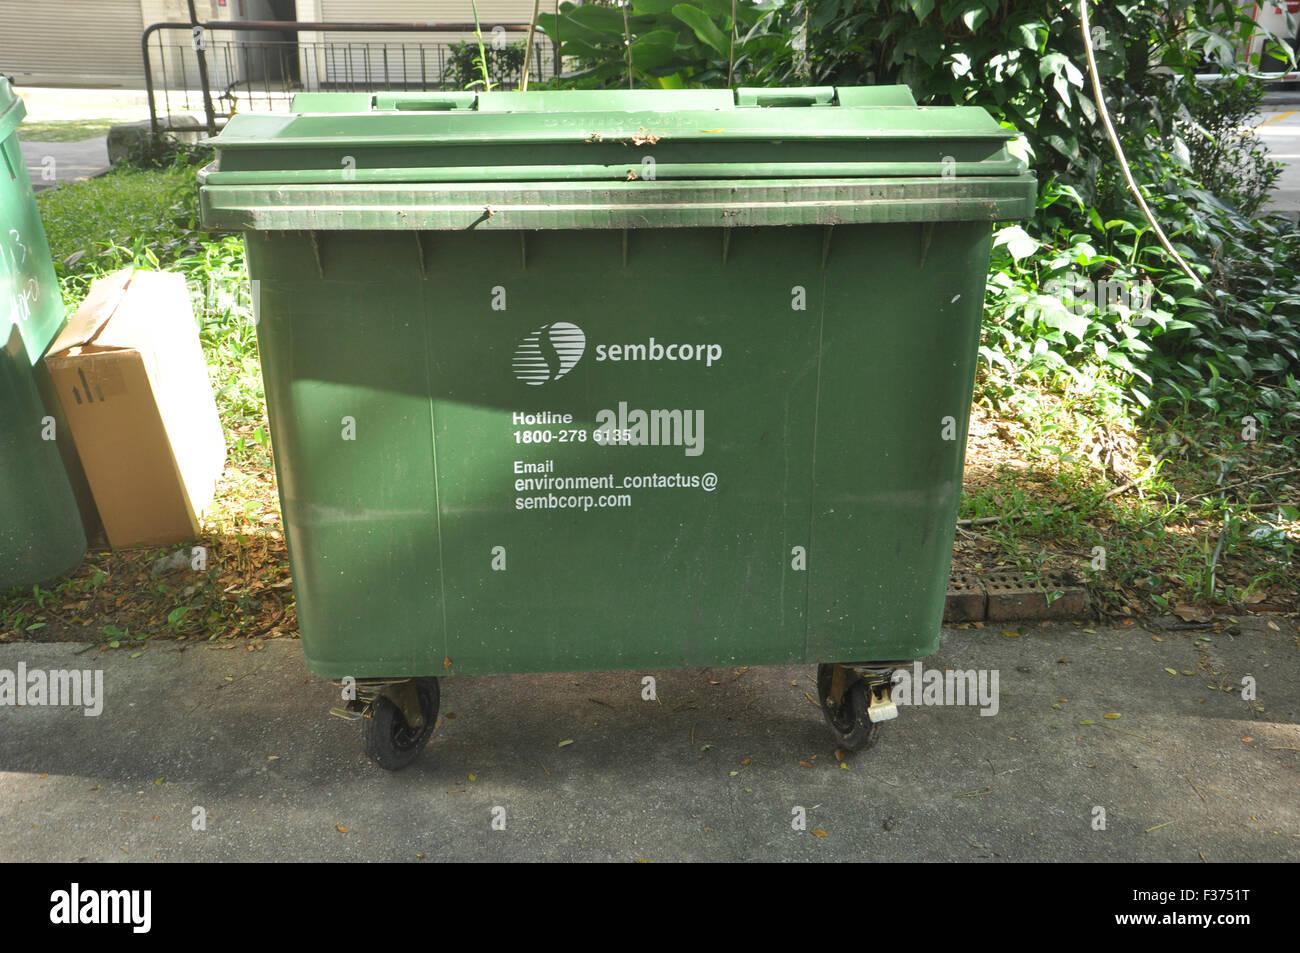 A garbage bin placed near Kallang Road, Singapore. - Stock Image